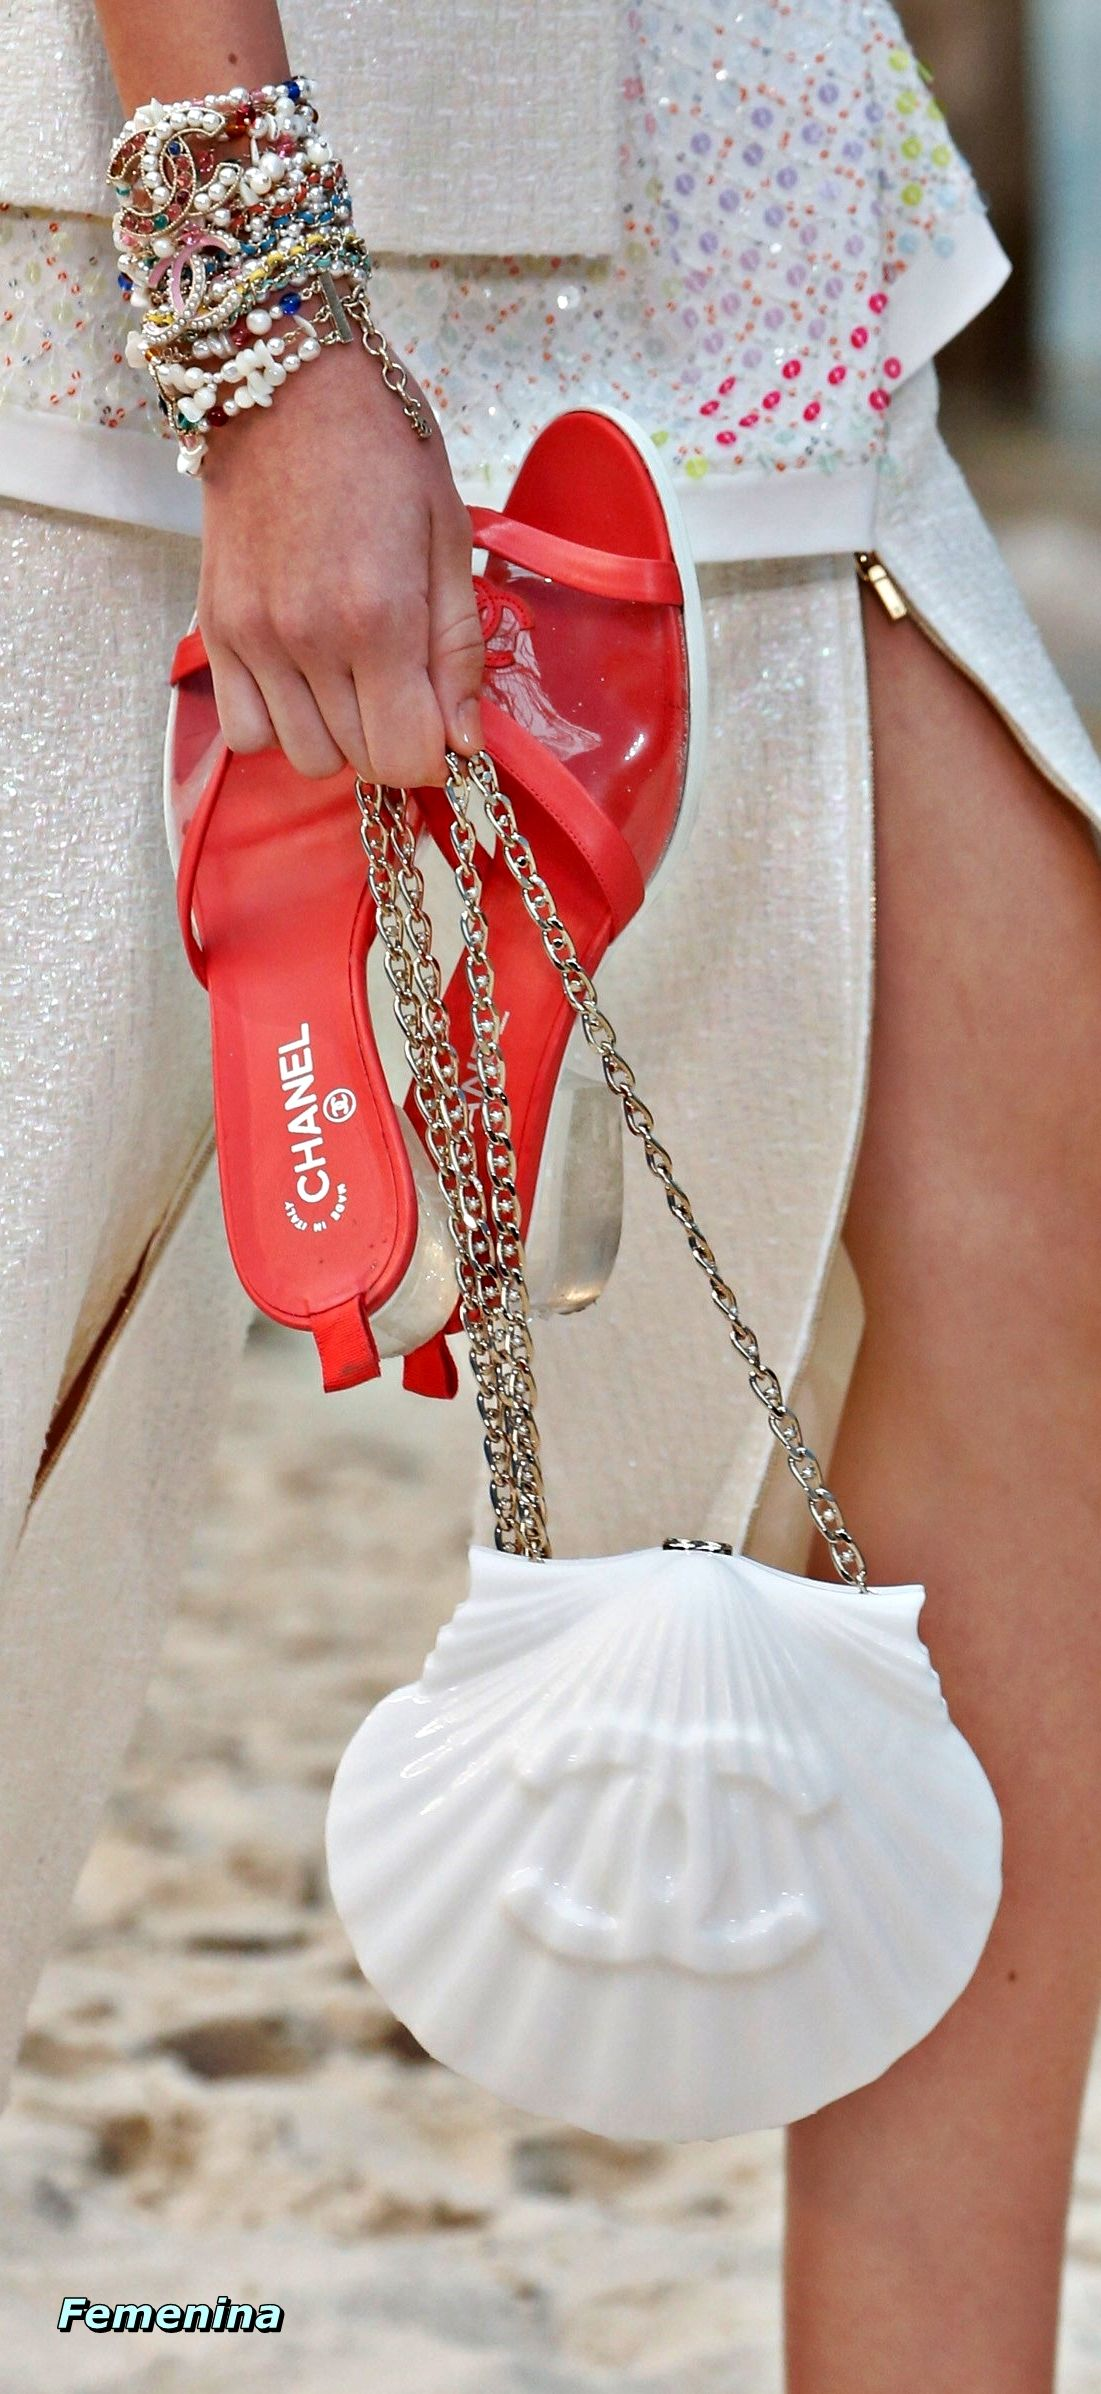 7ee2173da721 Chanel Spring Summer 2019 RTW -Details  bag accessories